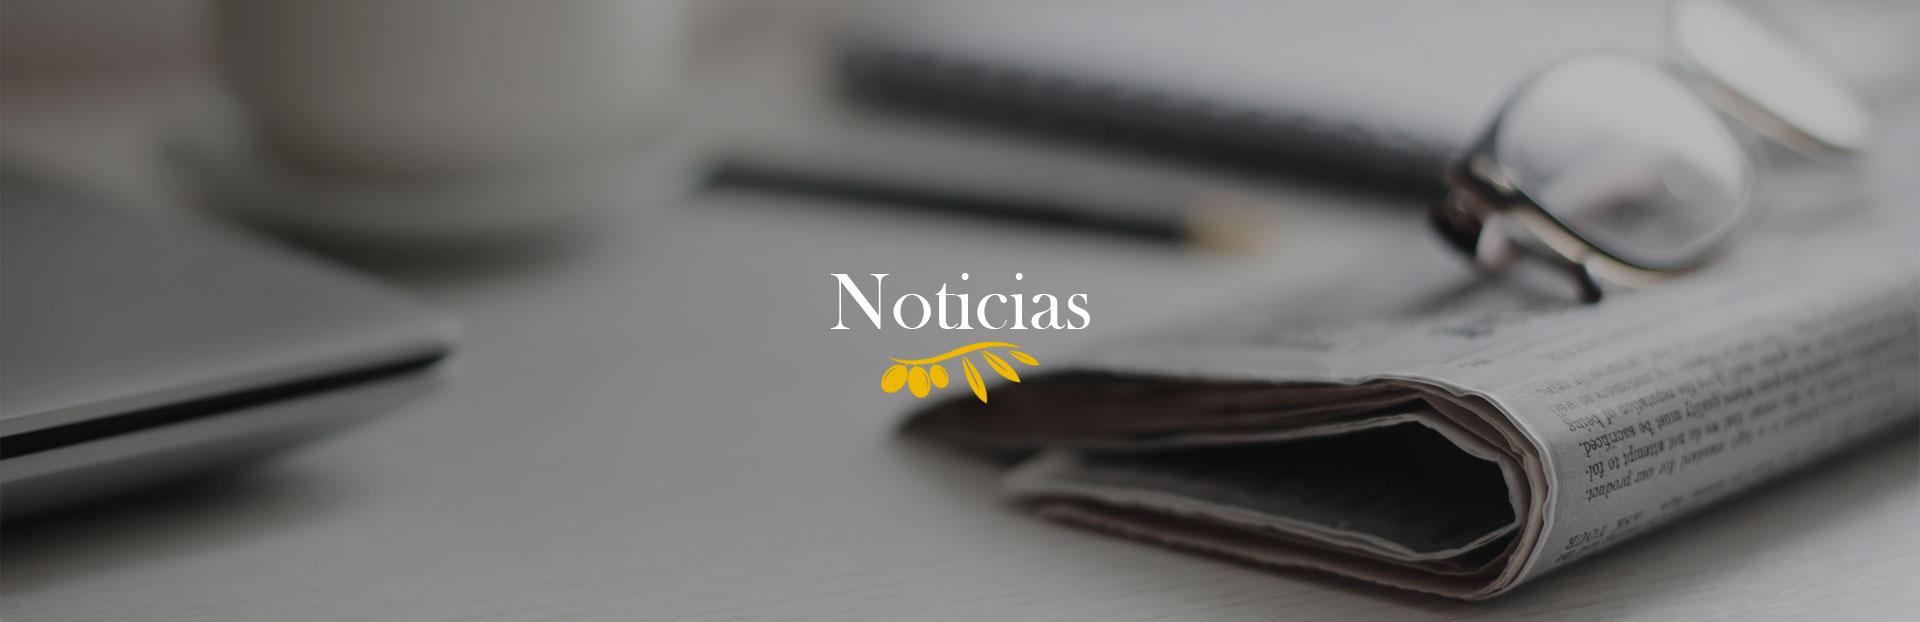 AceitesUnicos_slider_noticias_castellano